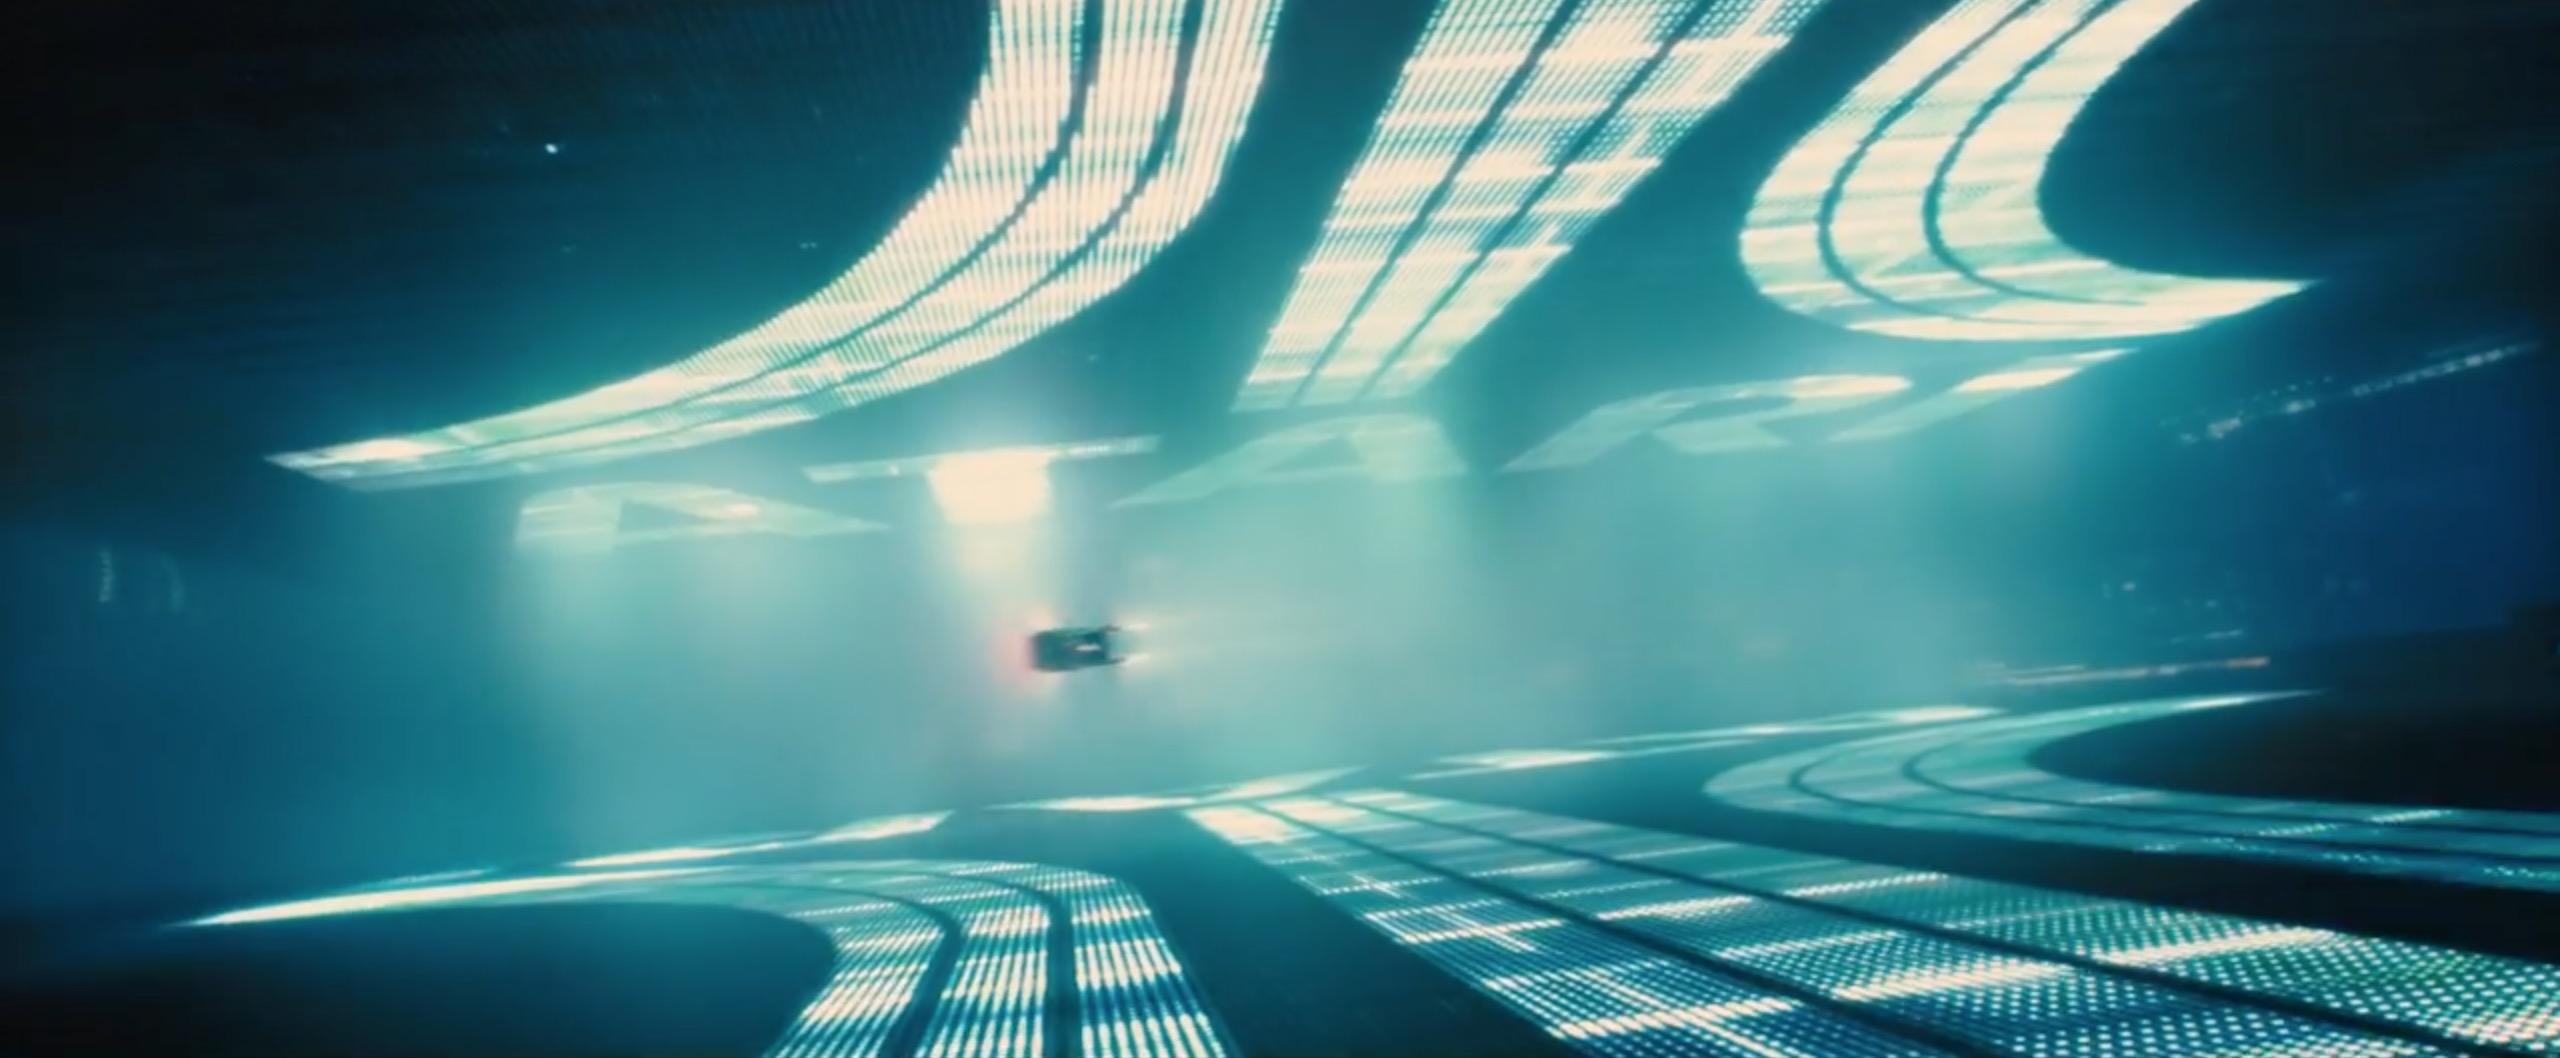 Blade Runner 2049 Trailer Breakdown: What You Missed - photo#25